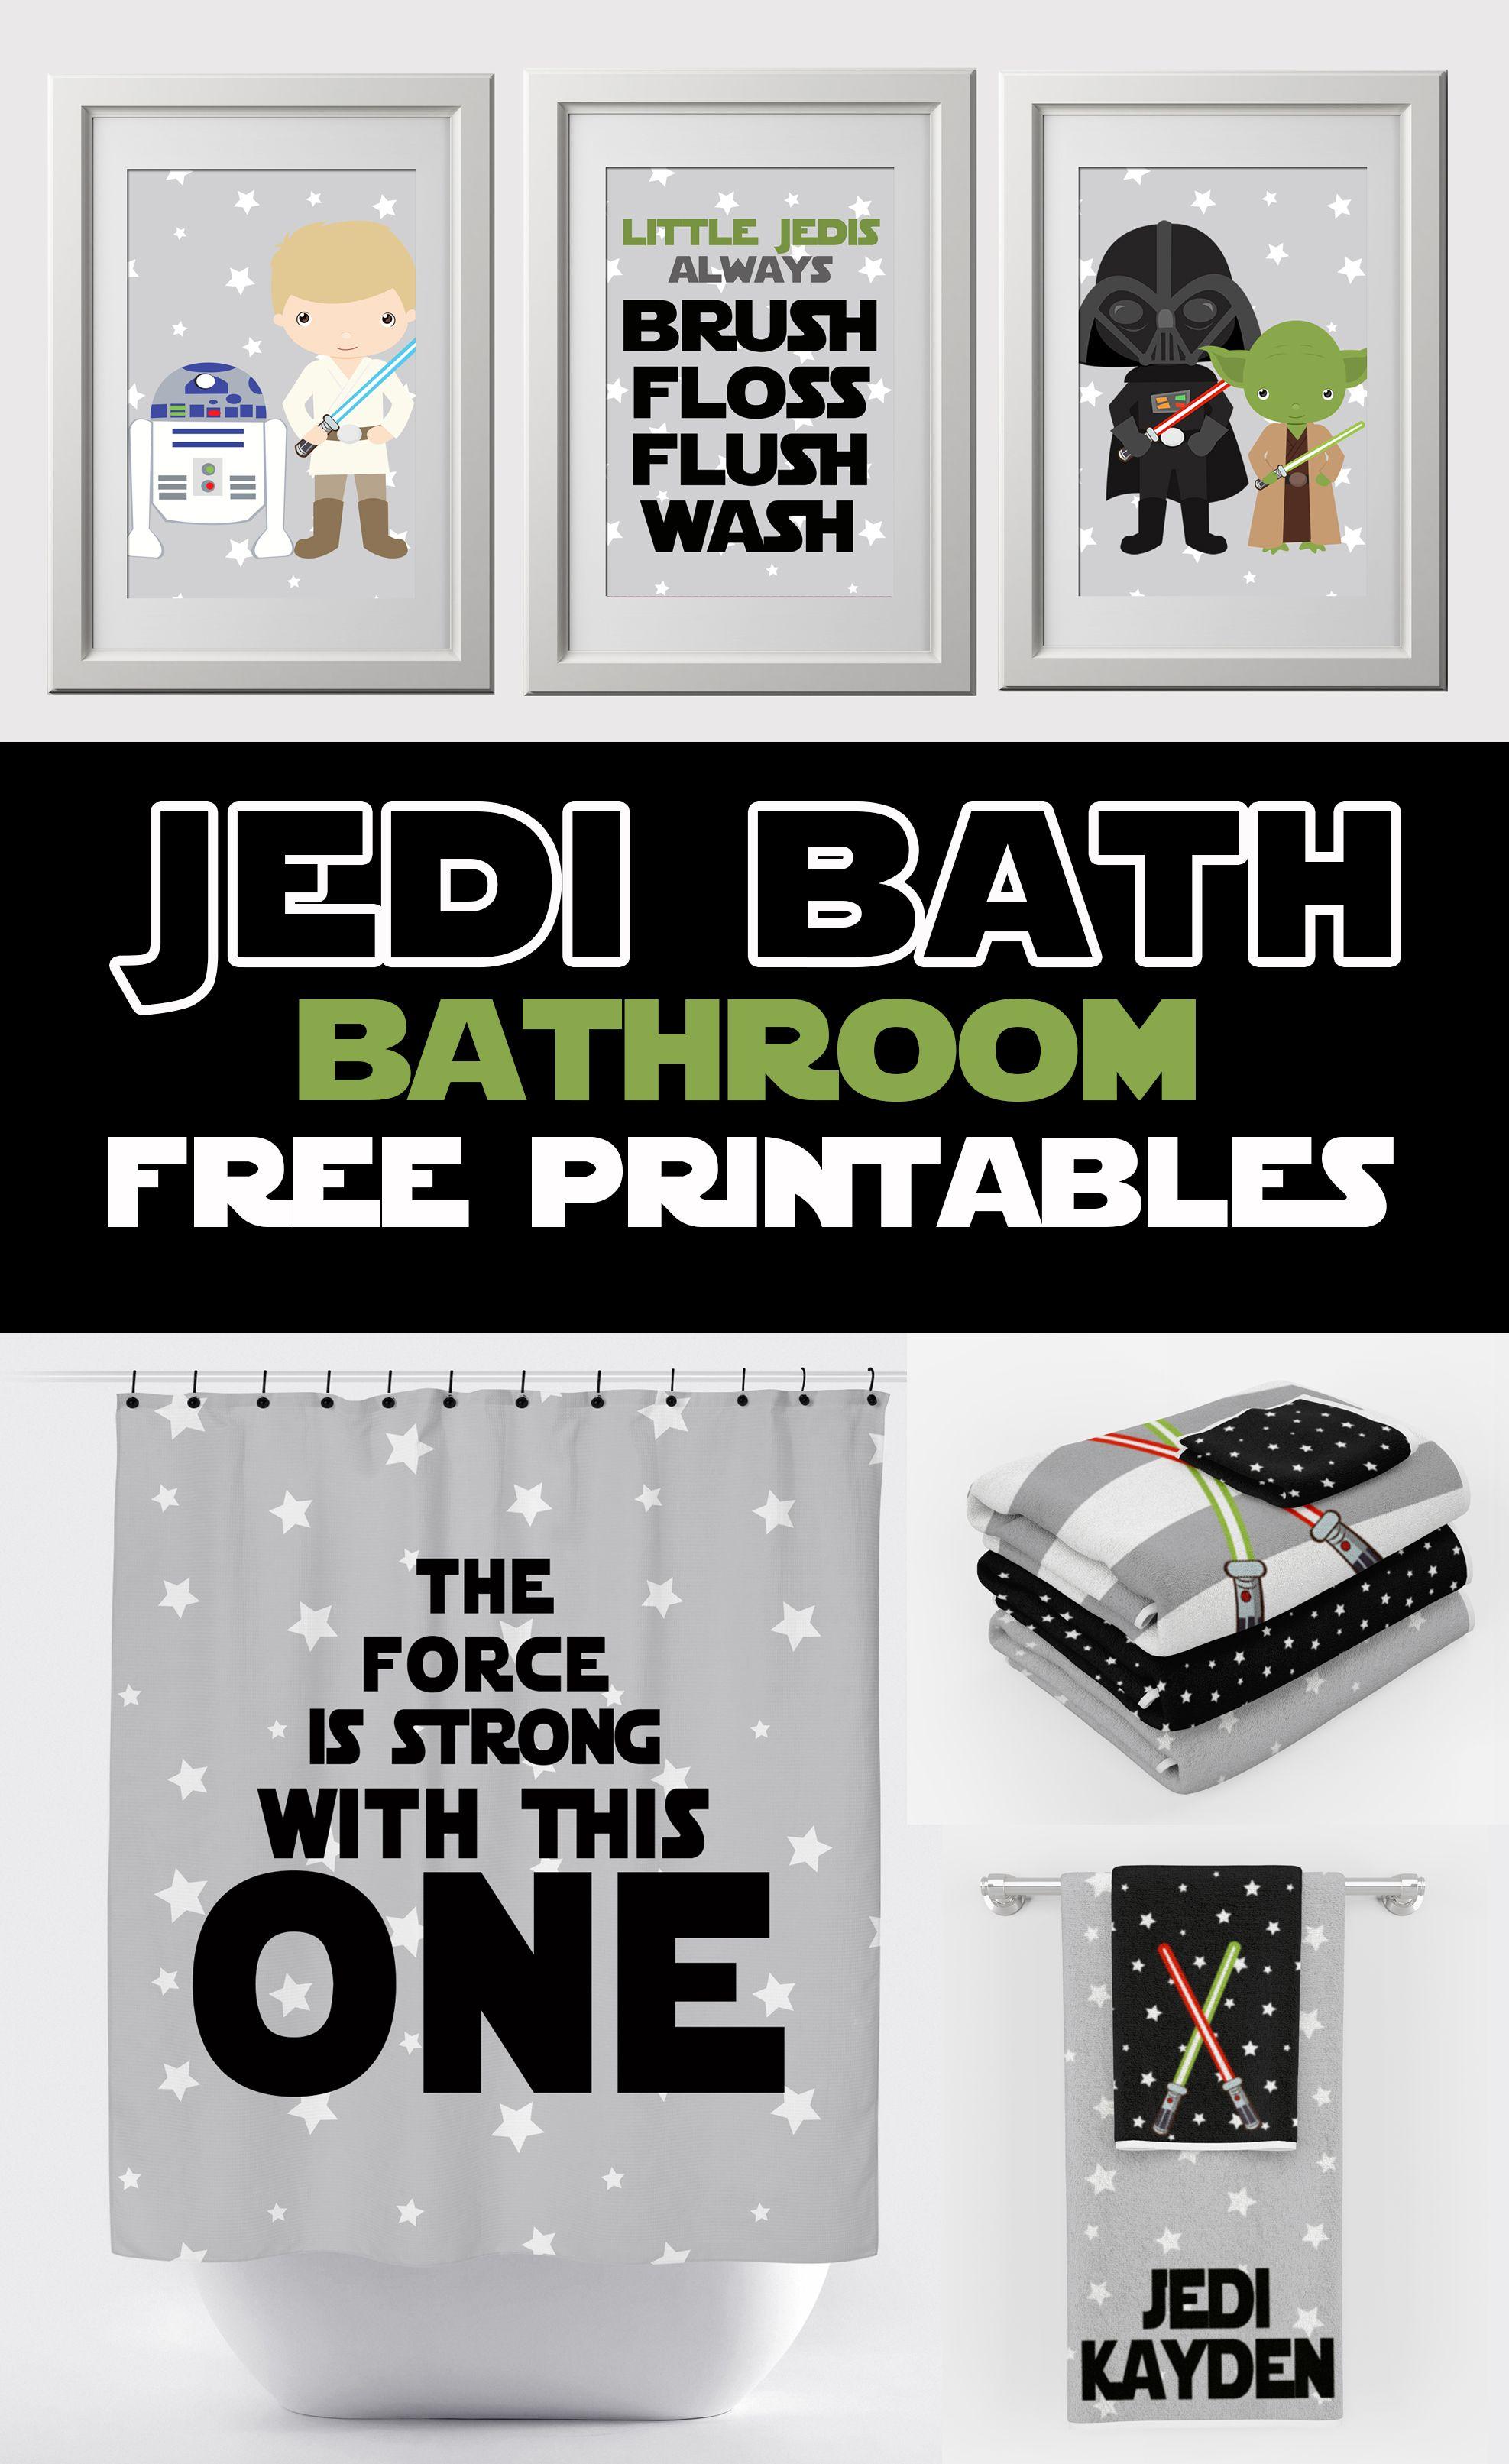 Star Wars Bathroom Toilet Decal Aim Like A Jedi Star Wars Bathroom Star Wars Bathroom Decor Star Wars Themed Bathroom